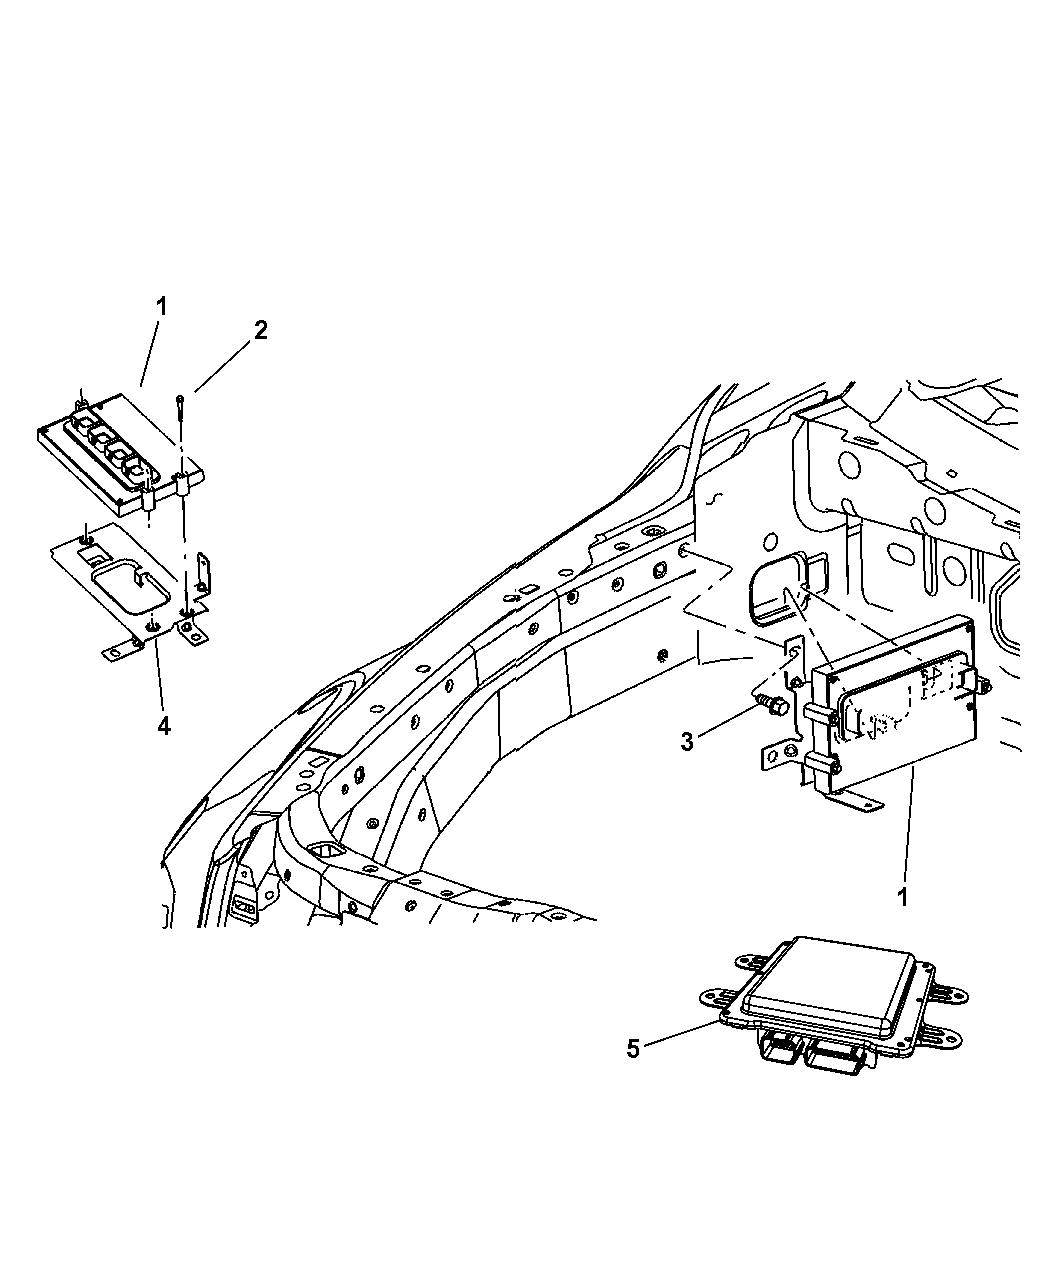 2008 Chrysler Aspen Modules  Engine Compartment